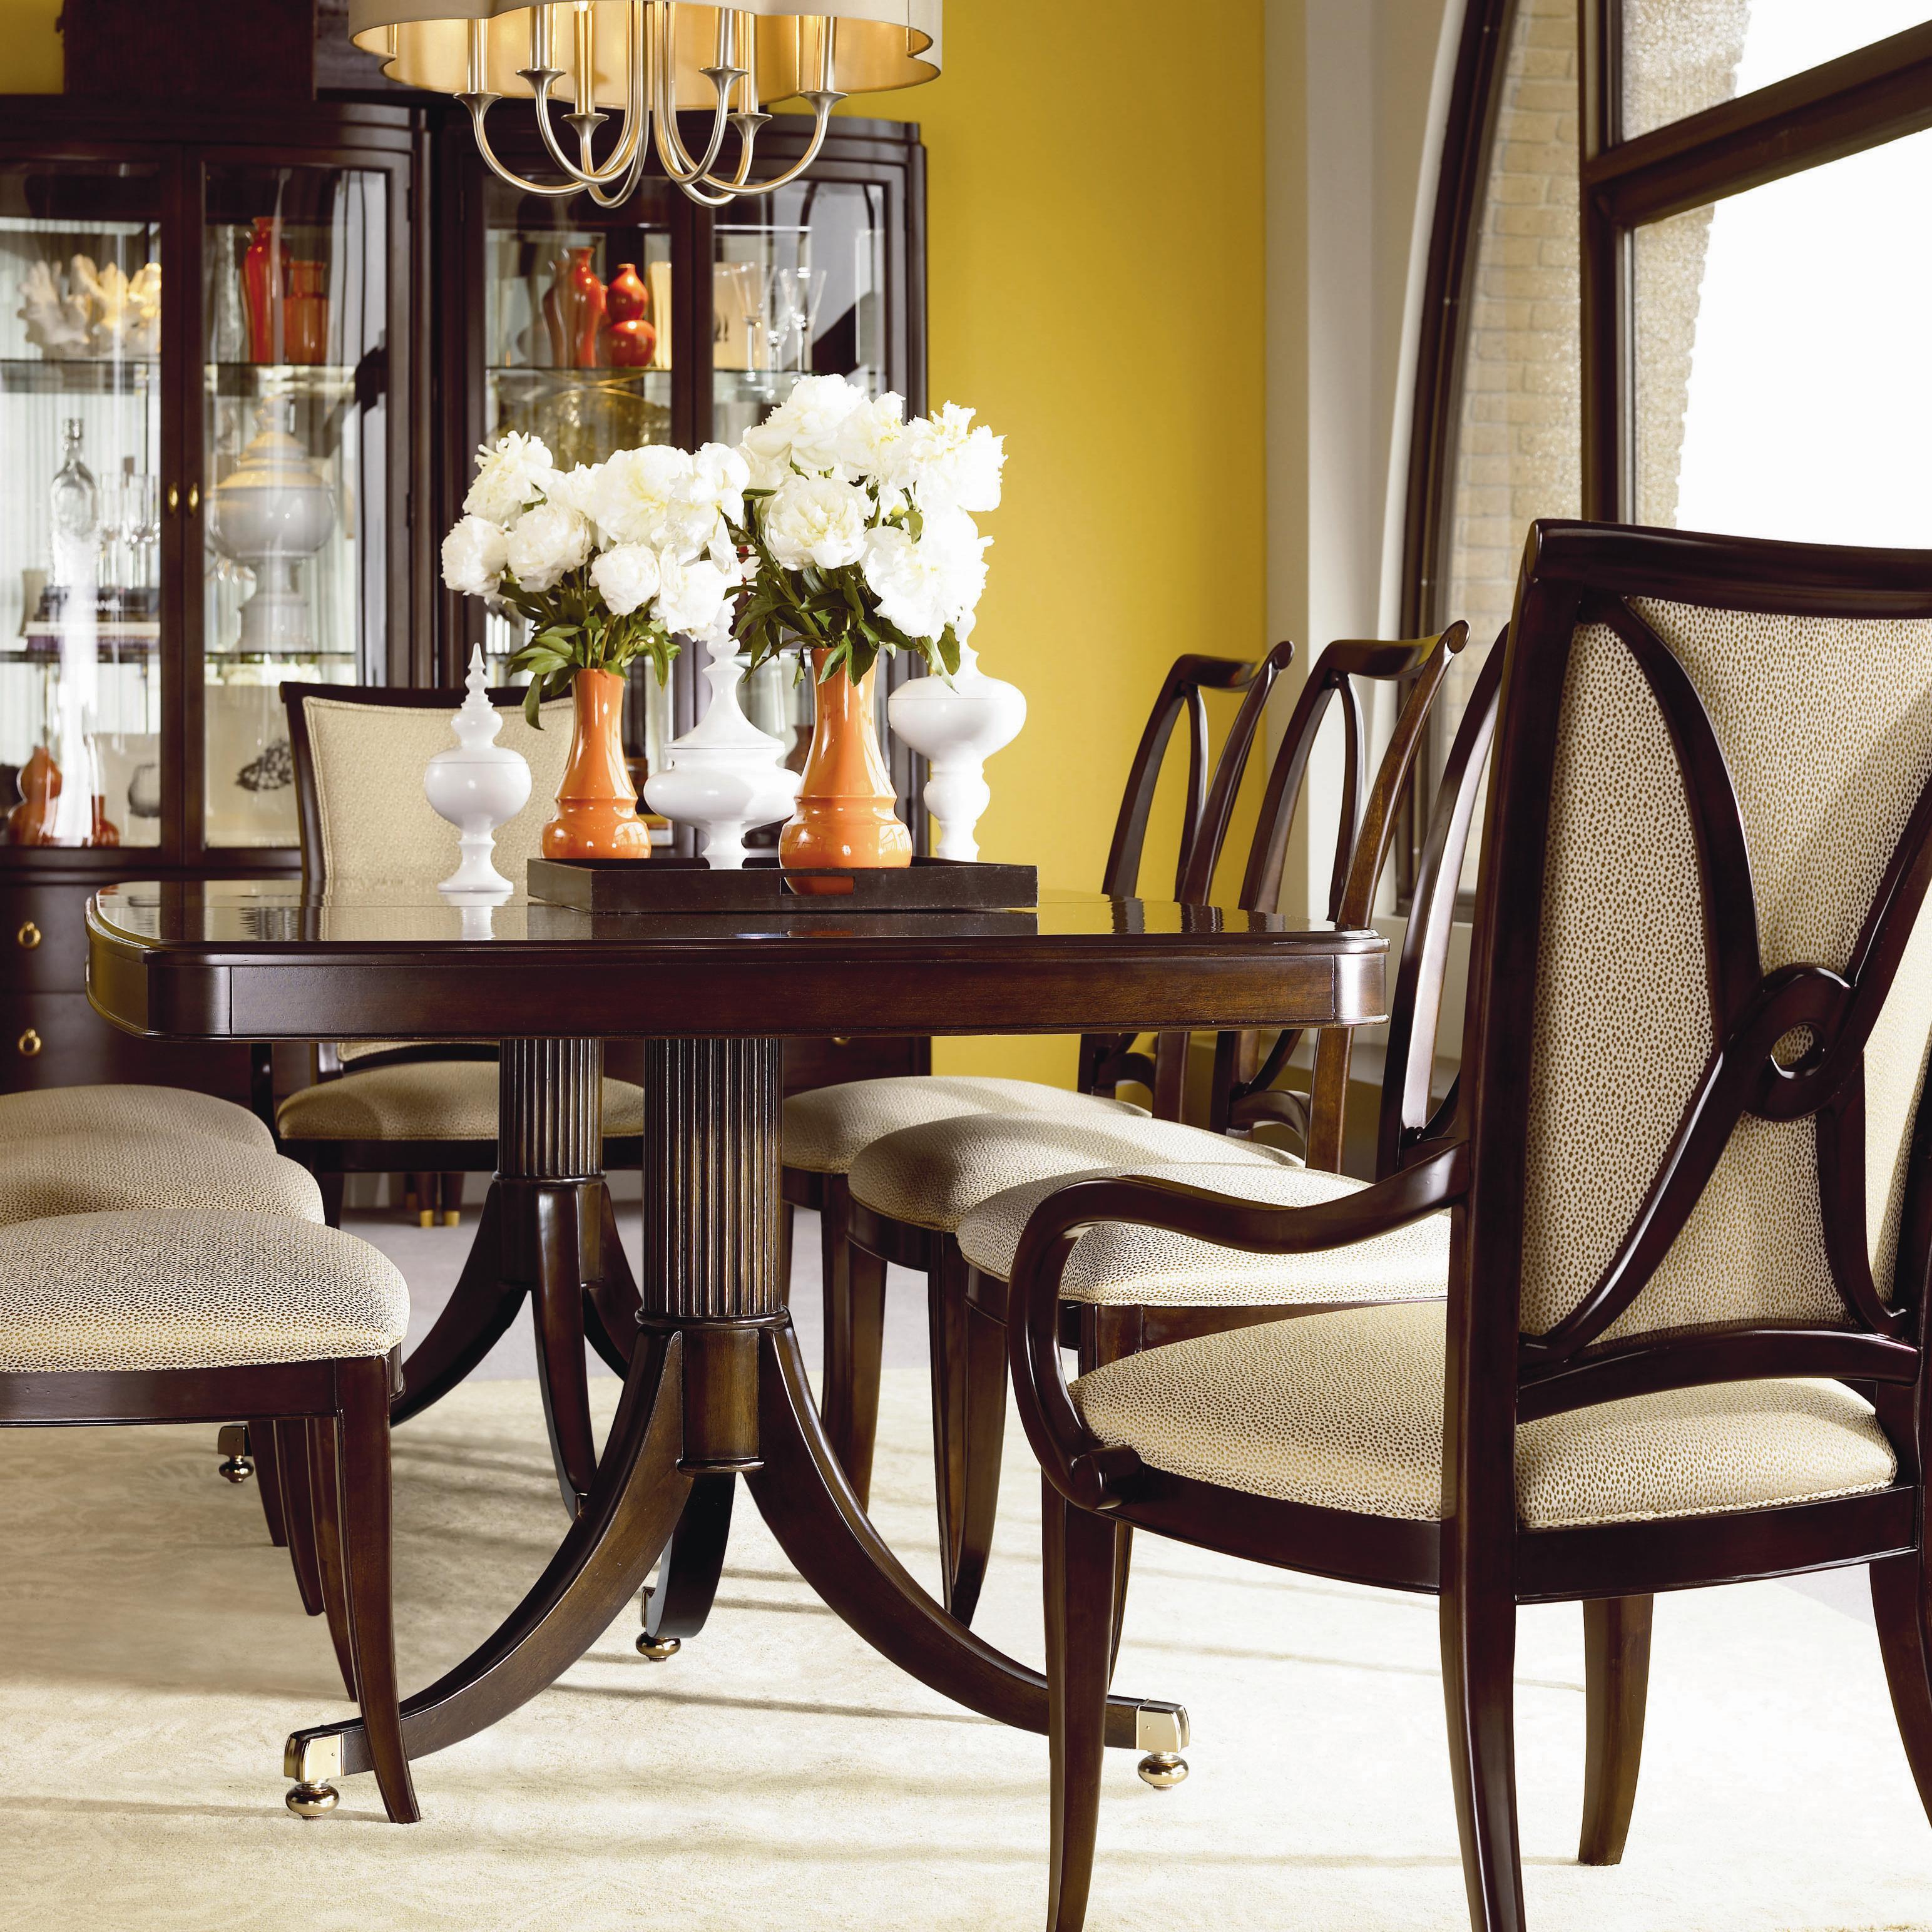 thomasville studio 455 45521 772 double pedestal dining table dunk bright furniture. Black Bedroom Furniture Sets. Home Design Ideas